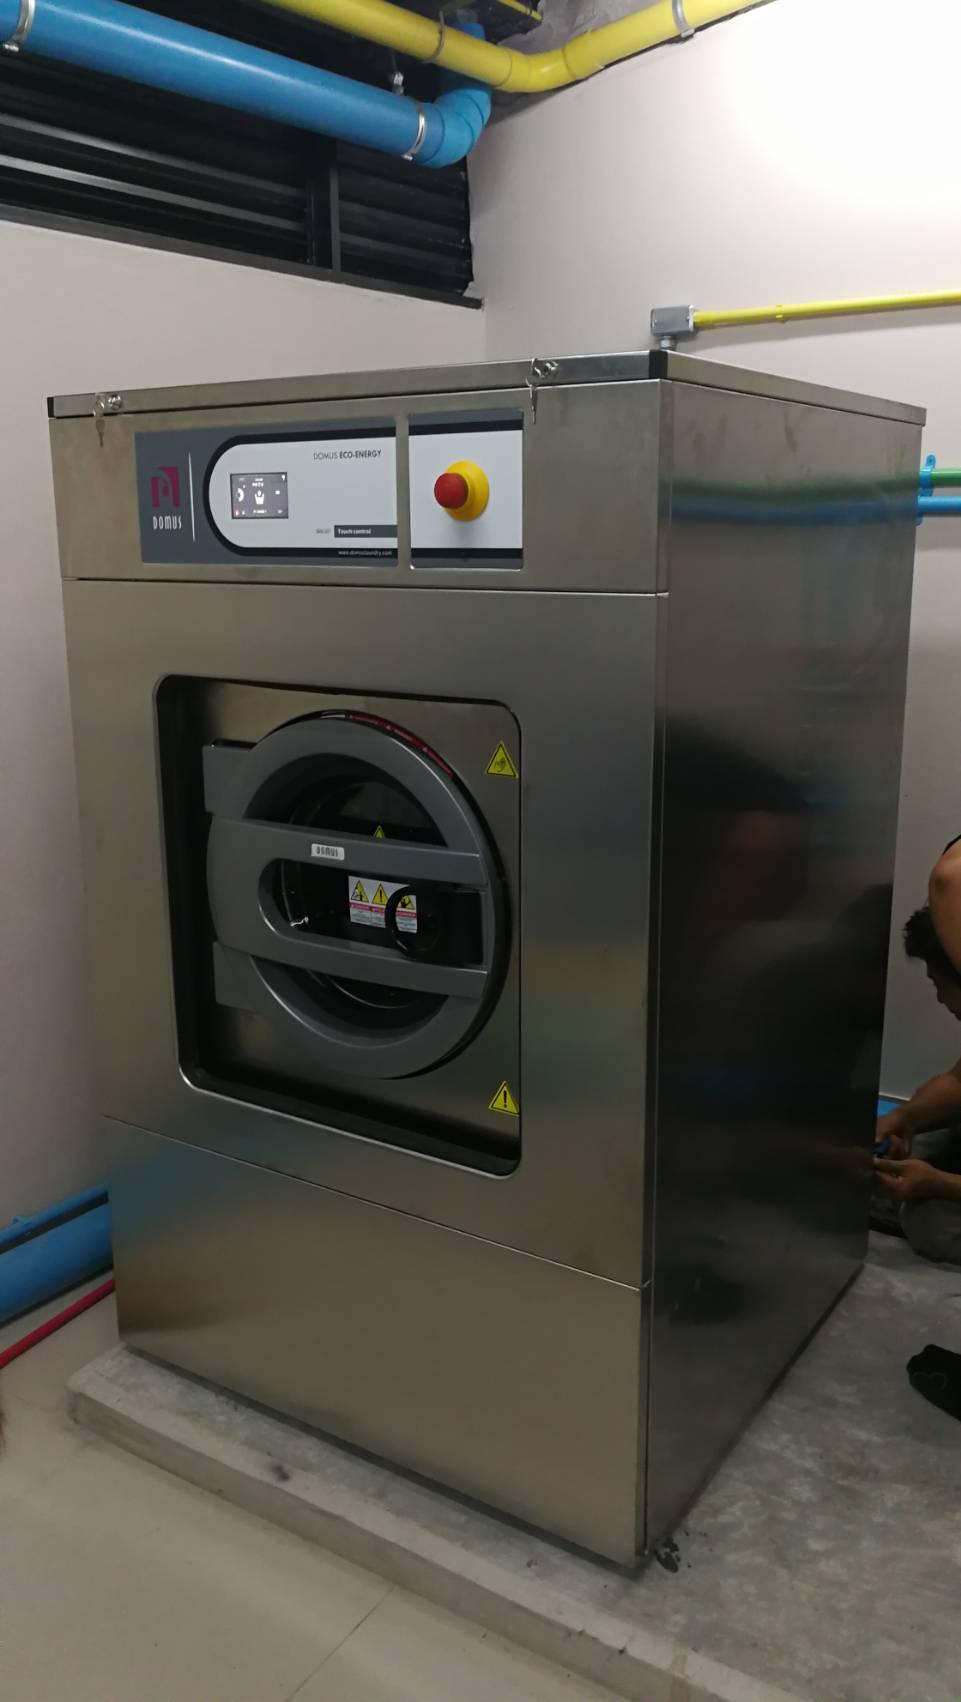 DOMUS, PRIMER, FAGOR, DANUBE, DHS, โดมุส, ขายเครื่องซักผ้าอุตสาหกรรม, เครื่องซักสลัดผ้าอุตสาหกรรม, เครื่องซักผ้าโรงแรม, เครื่องซักผ้าโรงพยาบาล, เครื่องซักผ้าโรงงาน, เครื่องซักผ้ายุโรป, เครื่องซักผ้าราคาถูก, เครื่องซักผ้าลอนดรี้, washer extractor, soft mou